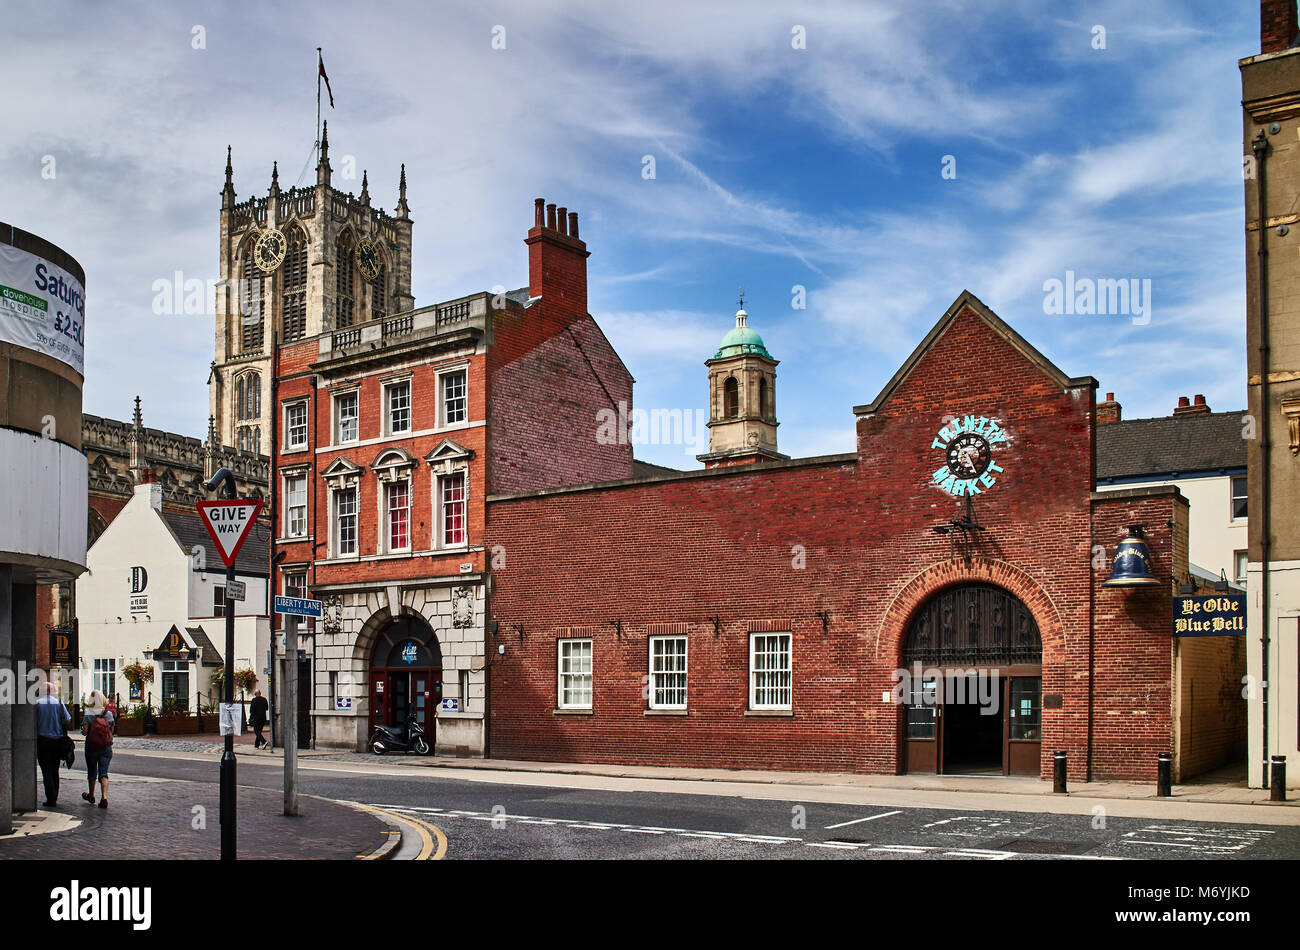 England, East Riding of Yorkshire, Kingston upon Hull city, Holy Trinity Church - Stock Image